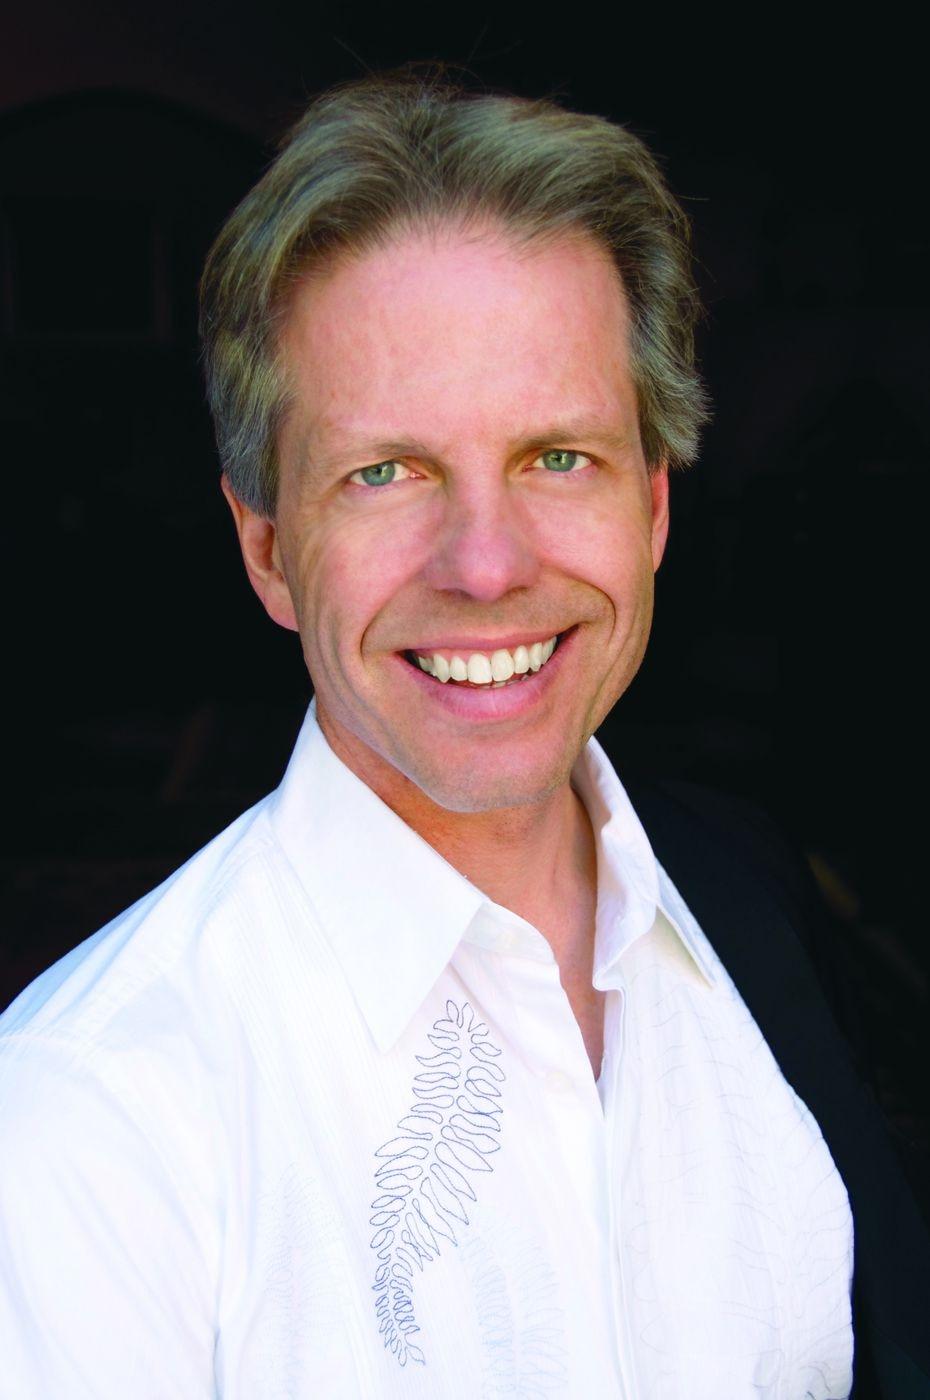 Joe Illick, newly named artistic director of Fort Worth Opera (Jackie Mathey)